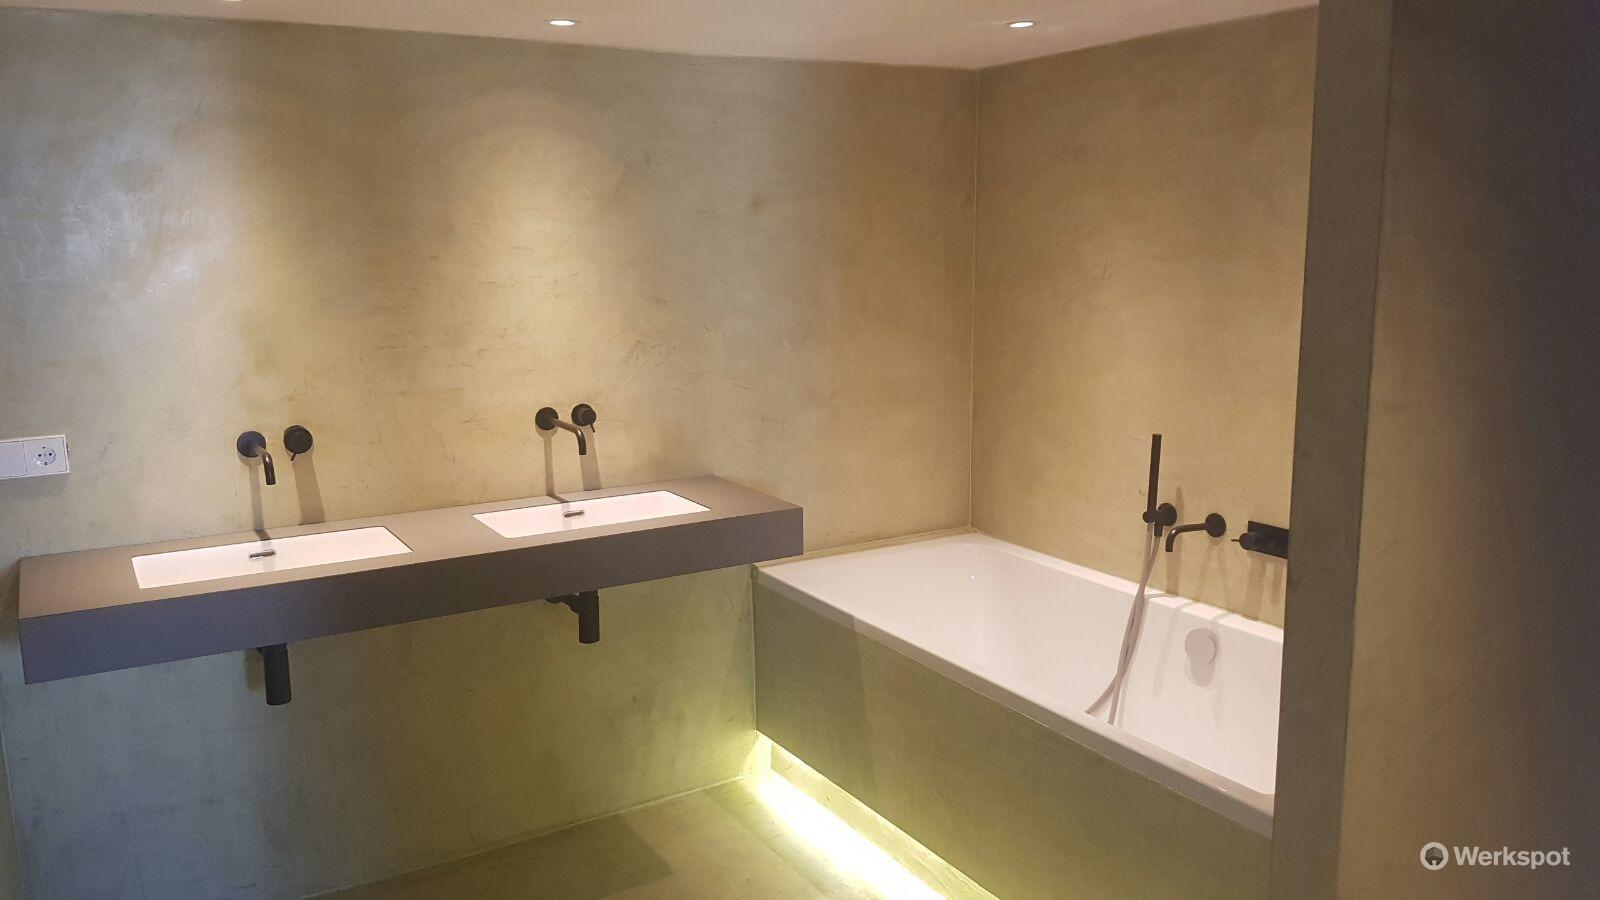 Badkamer Met Betonstuc : Betonstuc badkamer werkspot